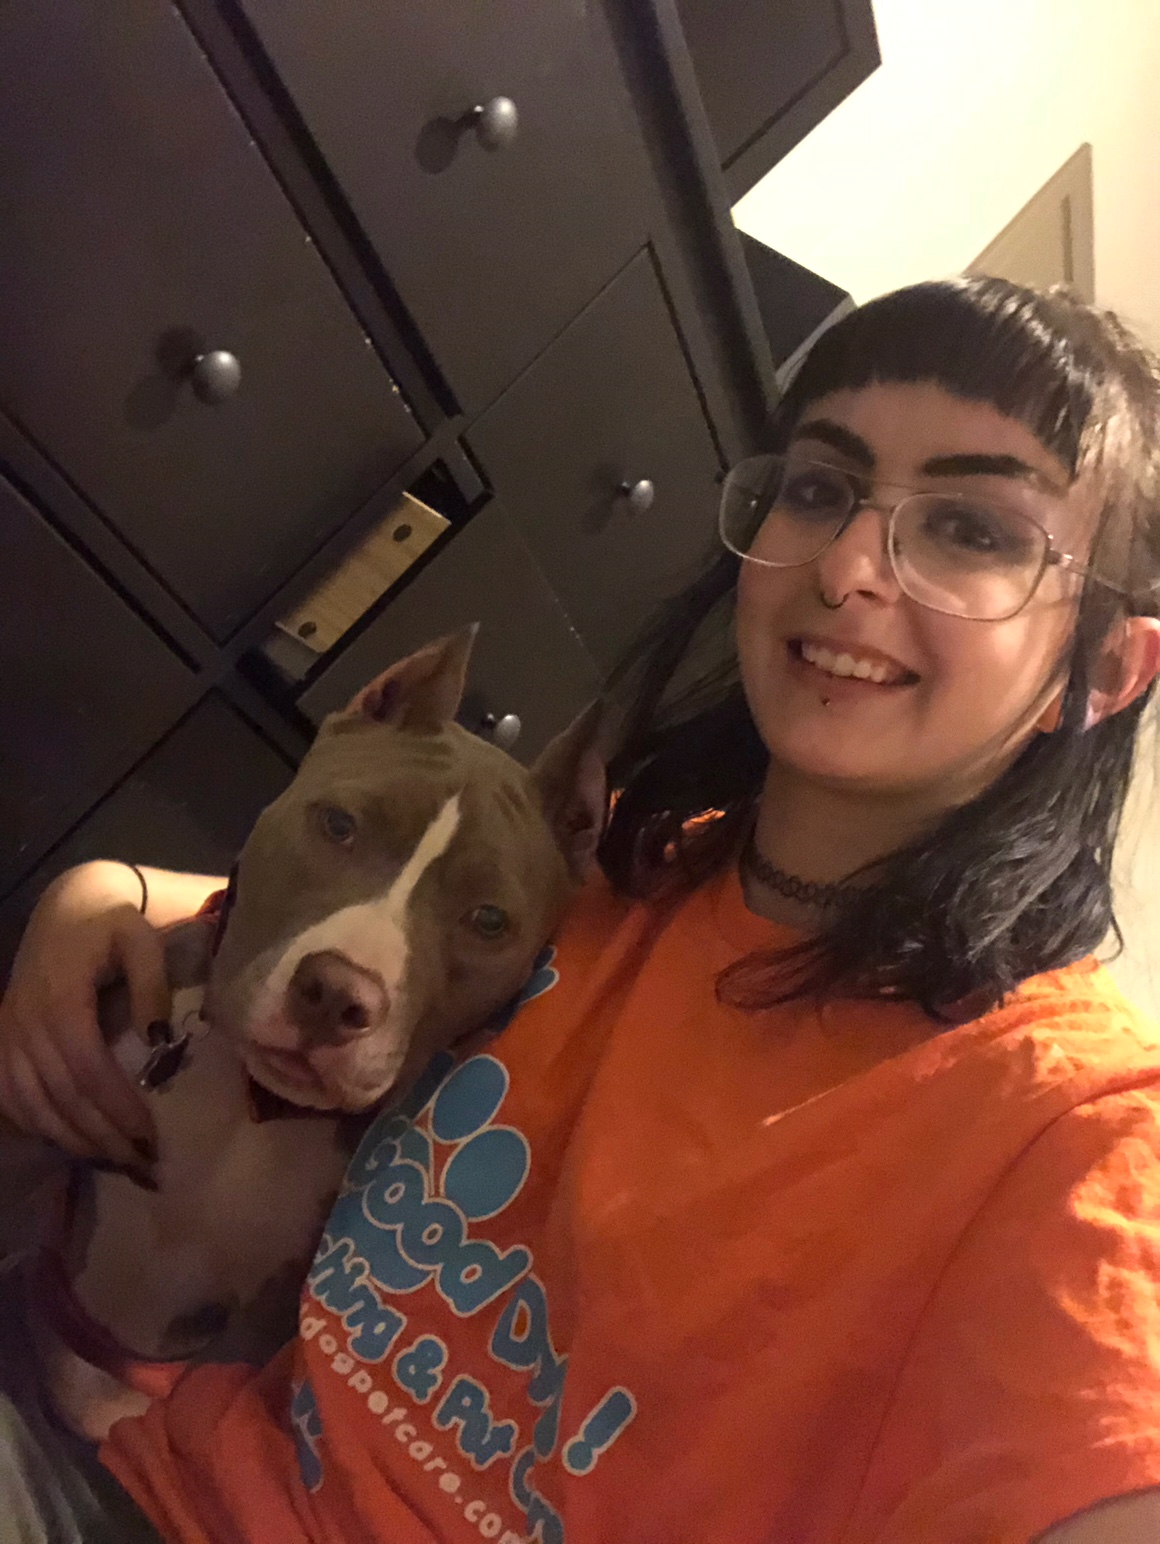 pet sitter bios professional dog walking and pet sitting in lilburn ga